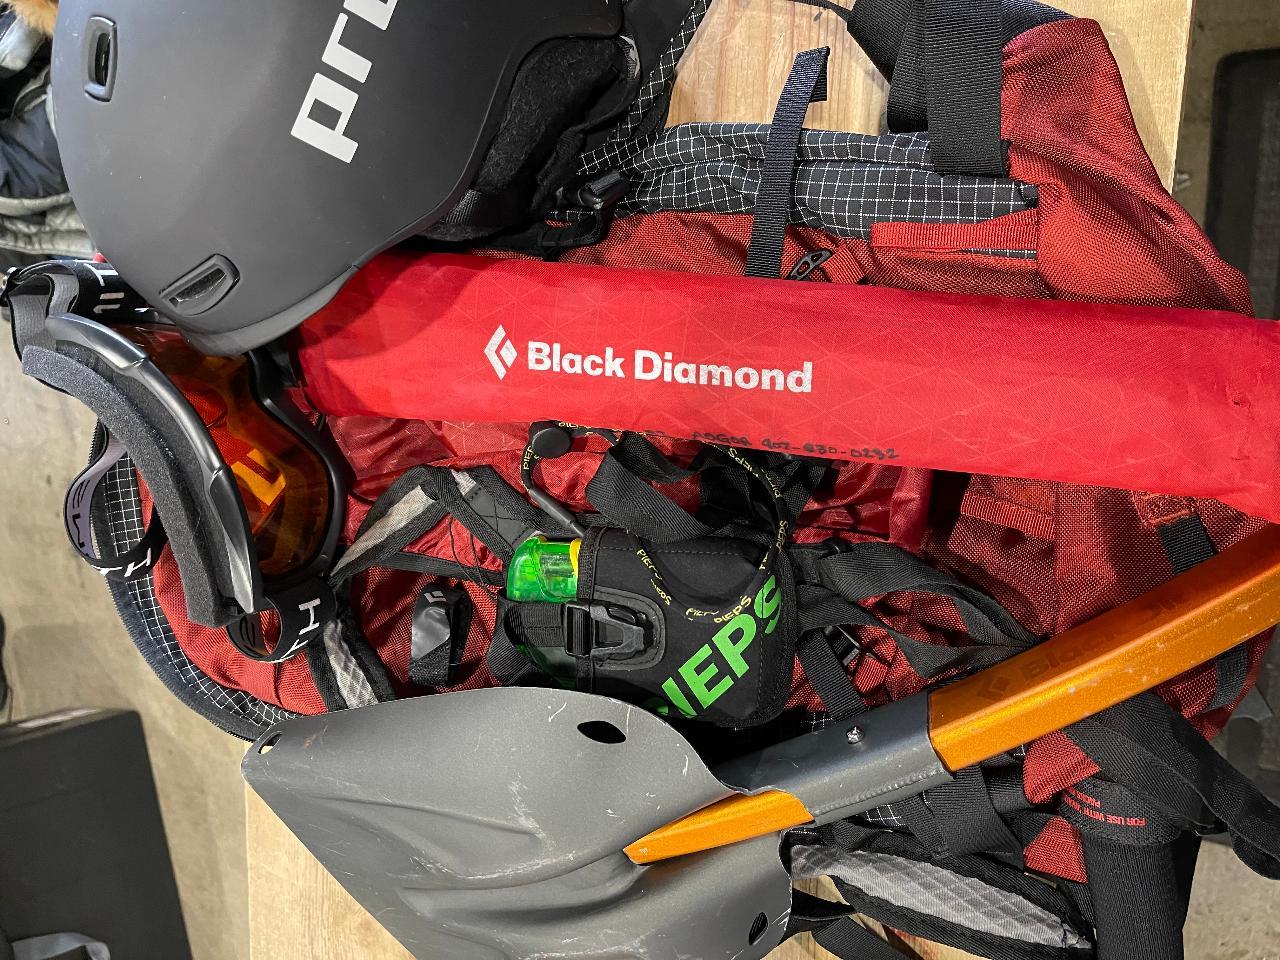 BC Access Pkg: Beacon/Probe/Shovel/Goggles/Helmet/BackpackAvalung